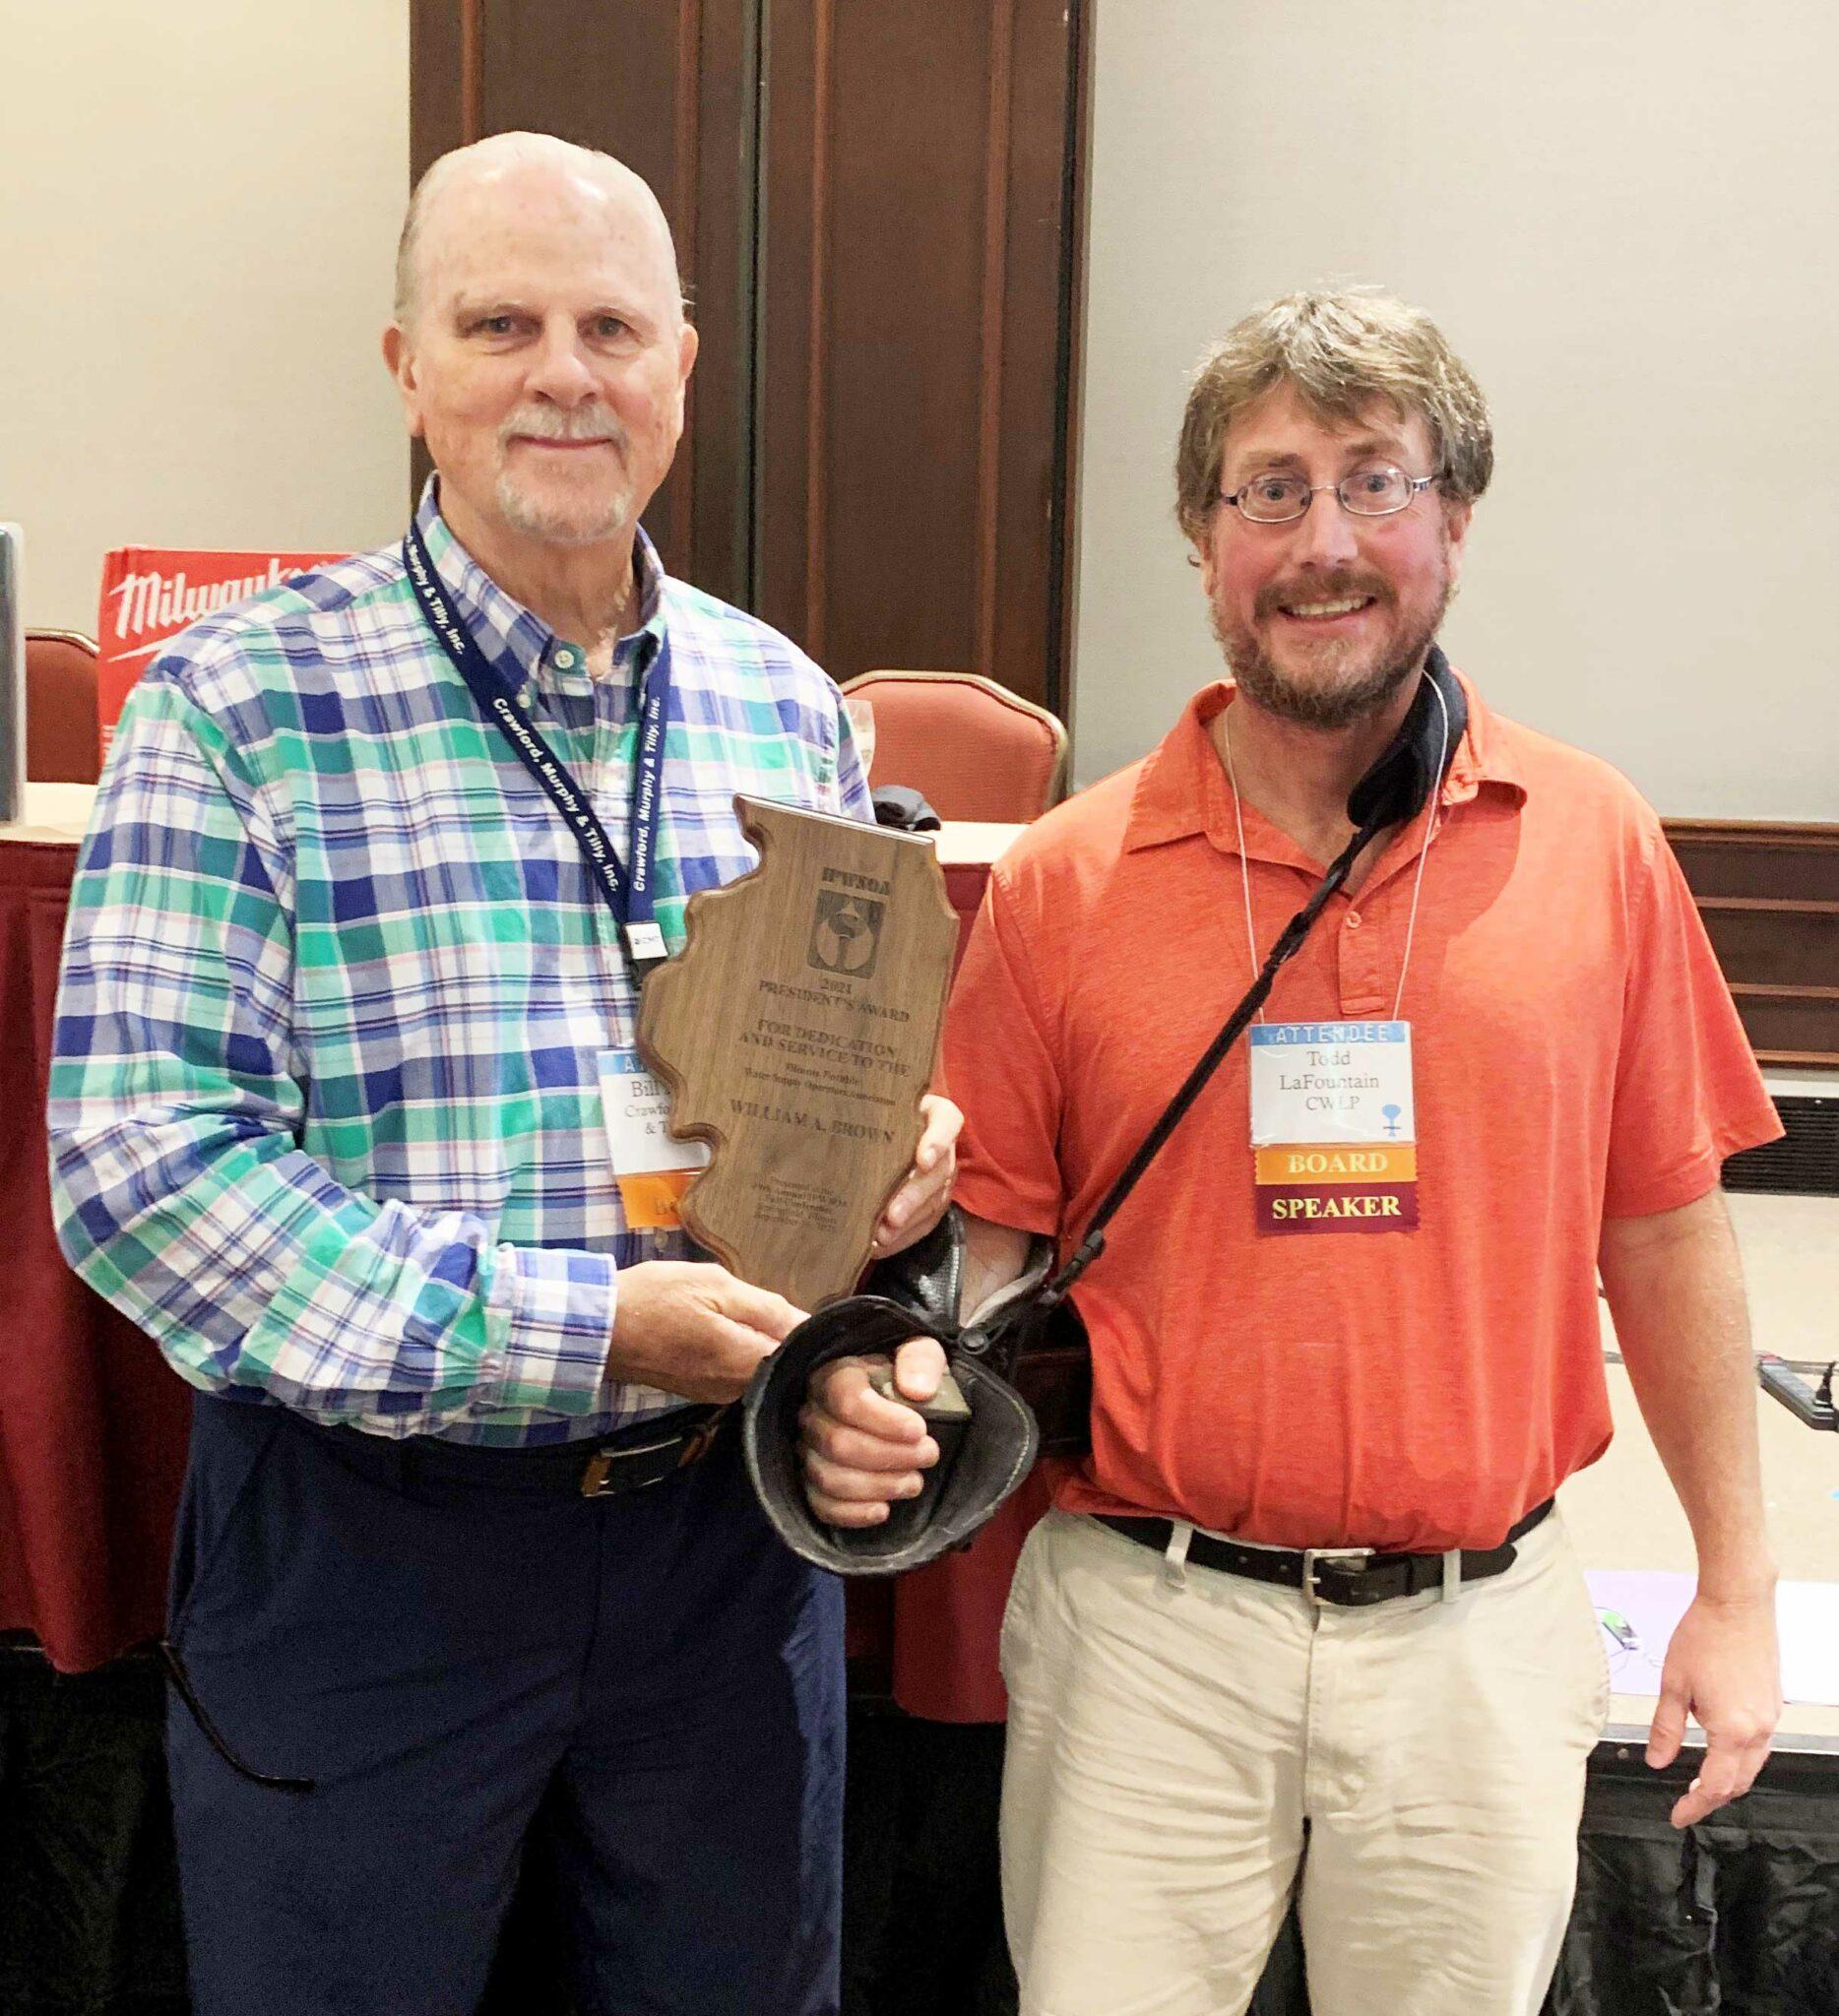 Bill Brown IPWSOA Presidents Award 2021